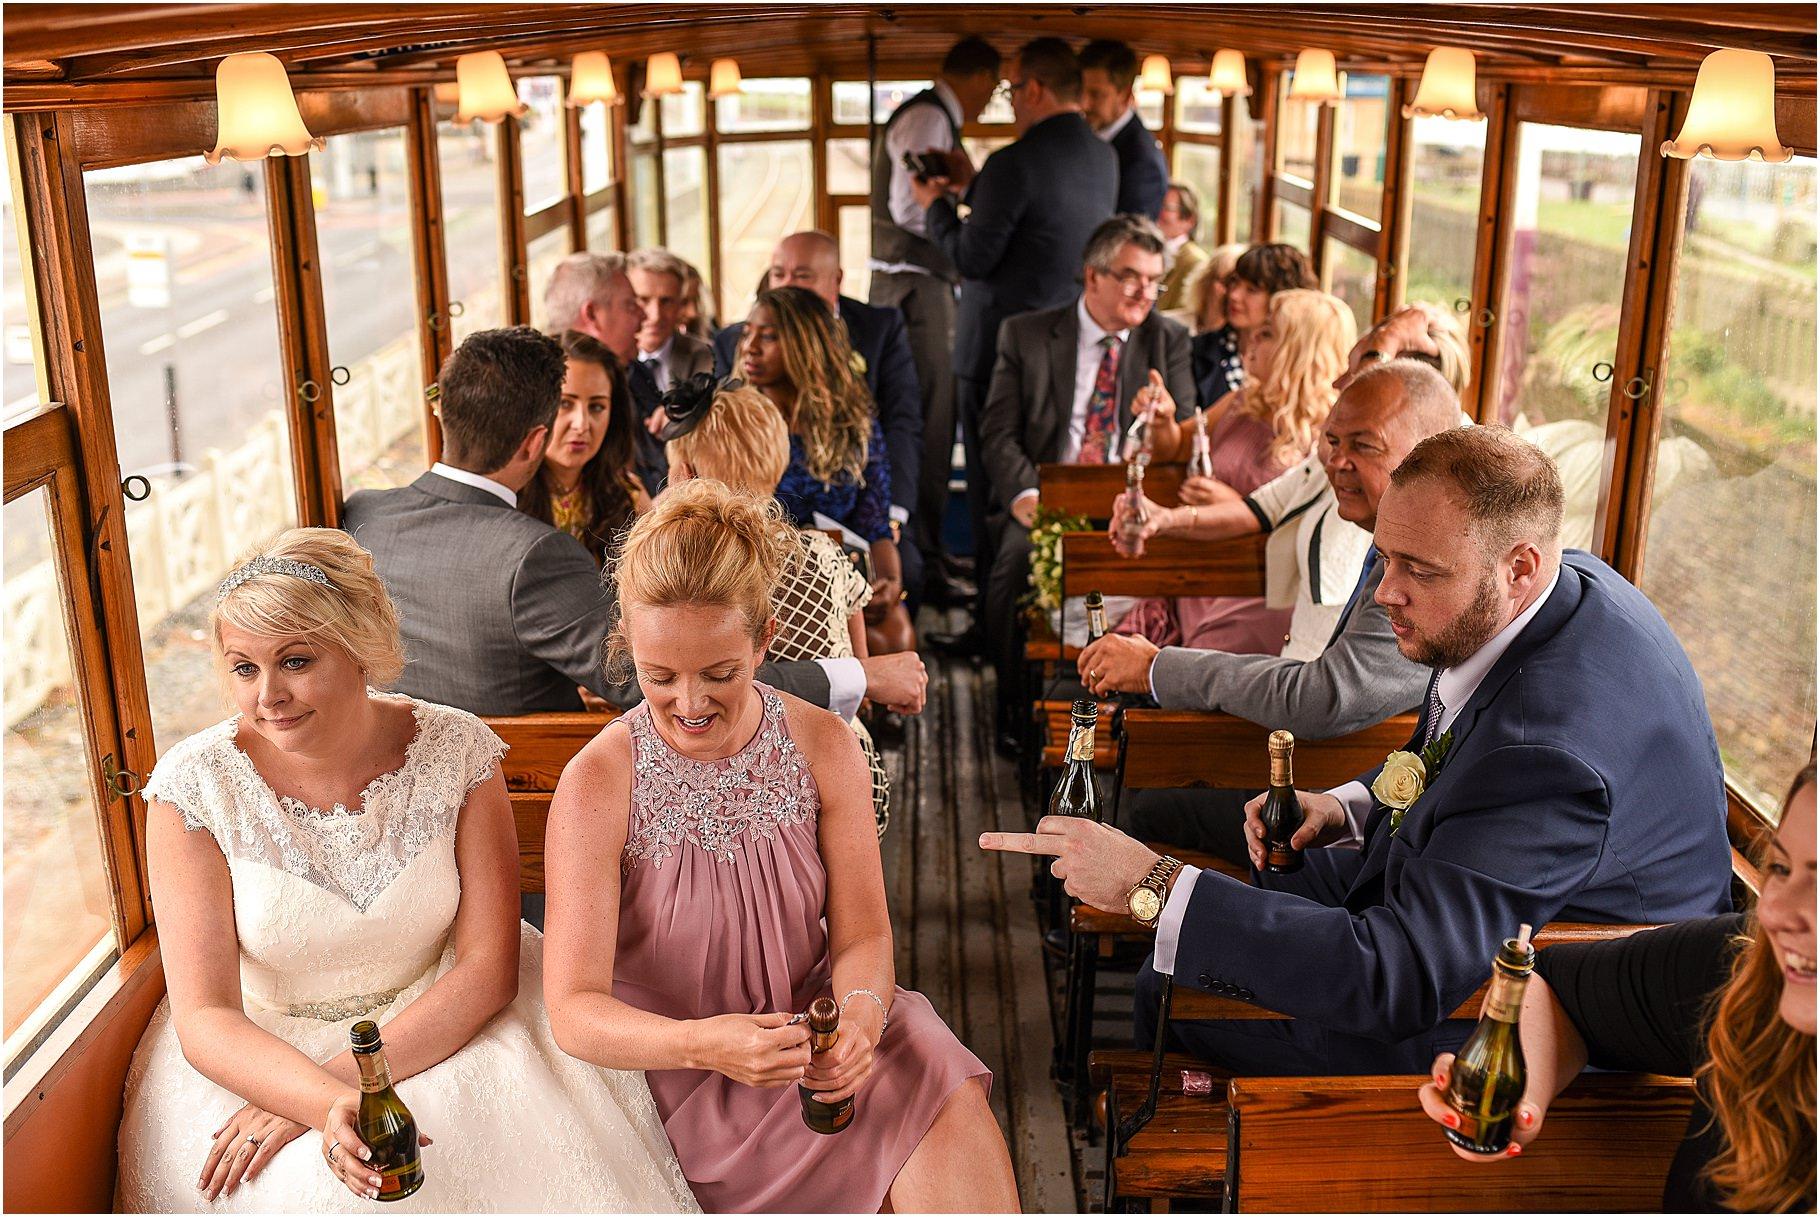 dan-wootton-photography-2017-weddings-175.jpg